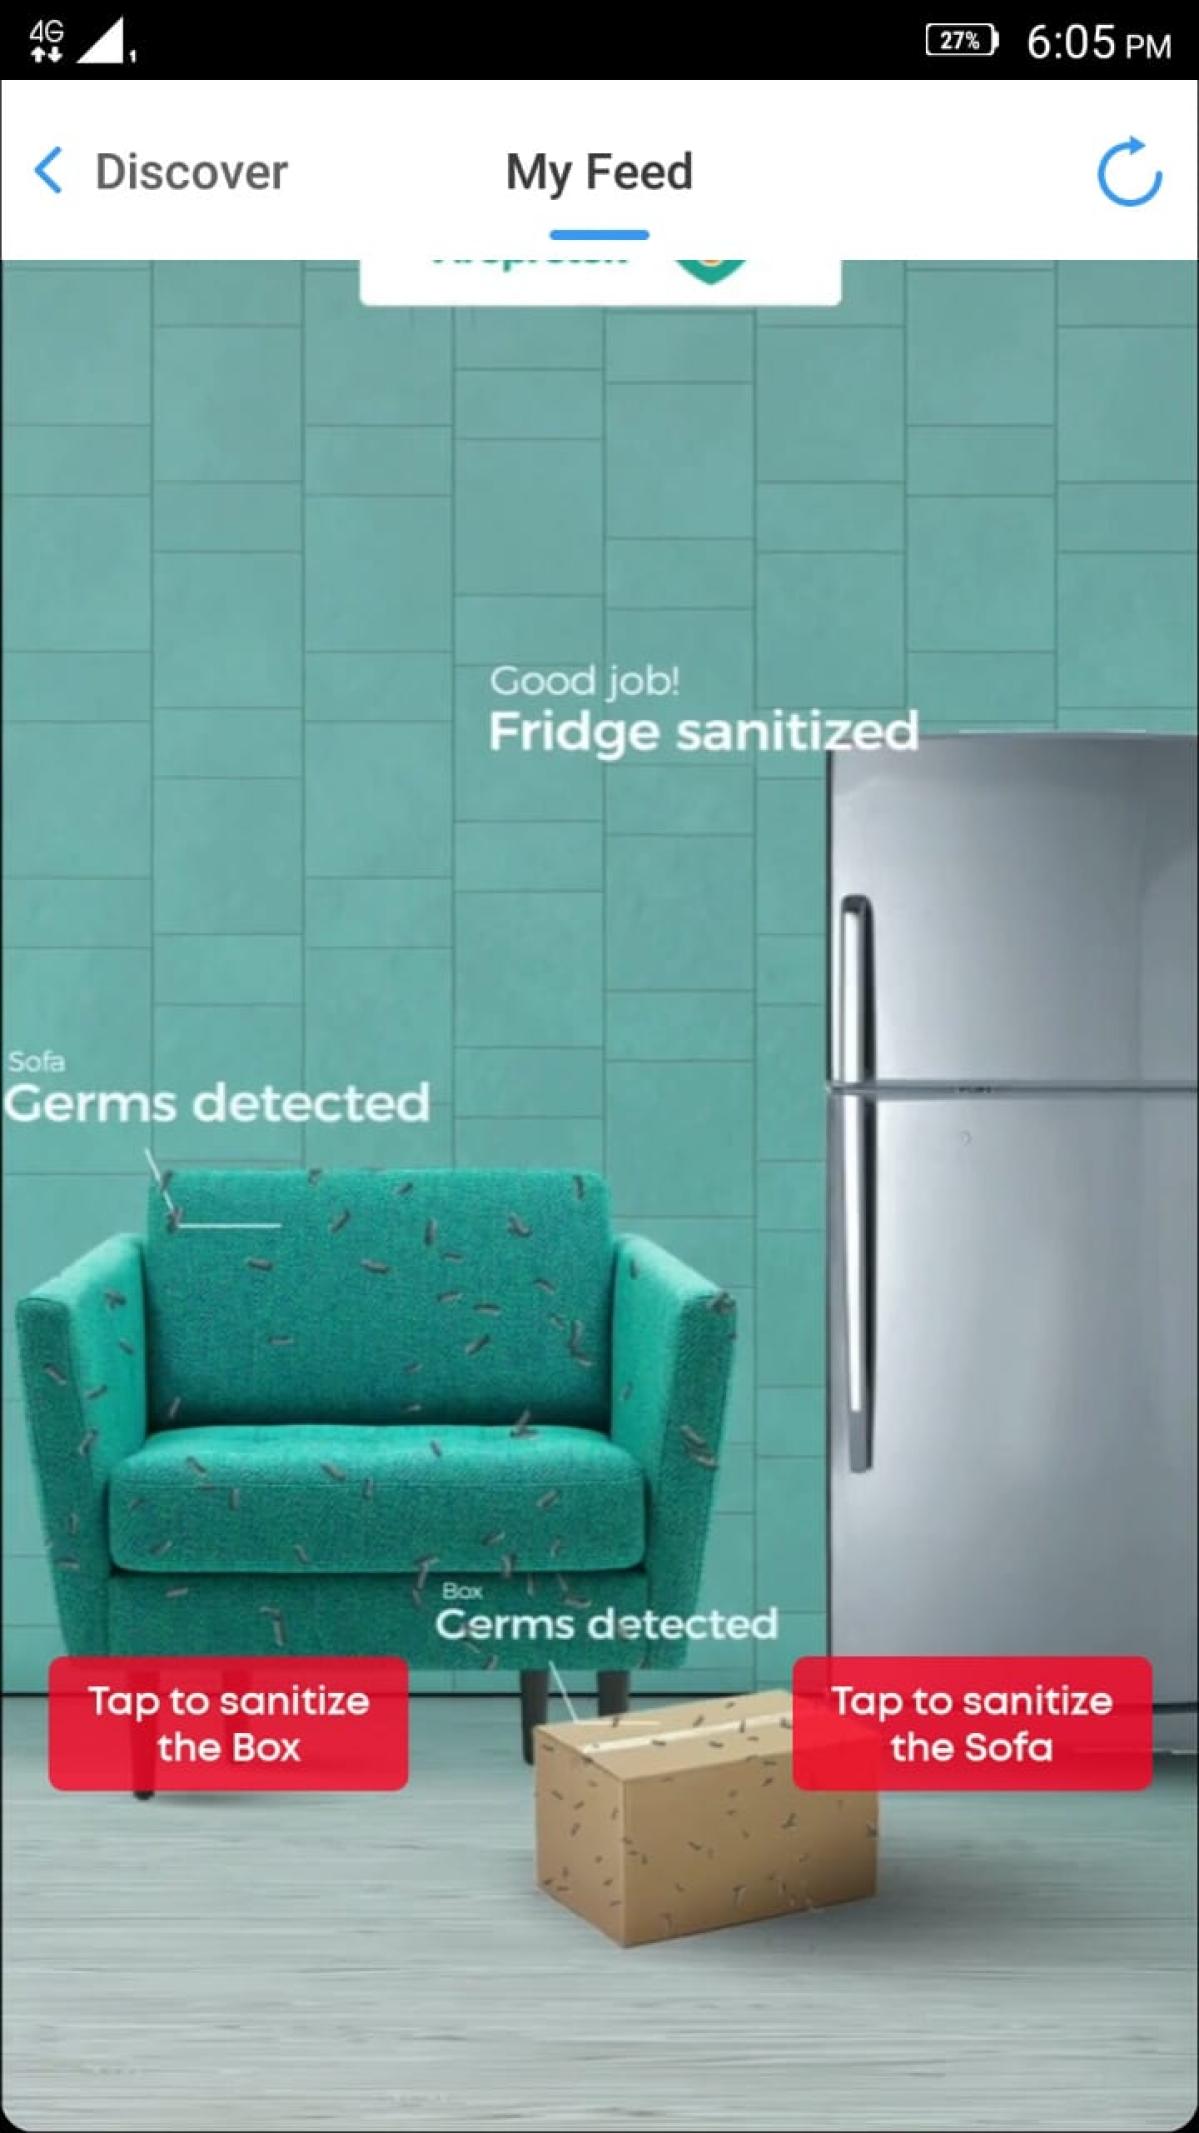 Inshorts gamifies ad for Asian Paints' sanitiser brand Viroprotek